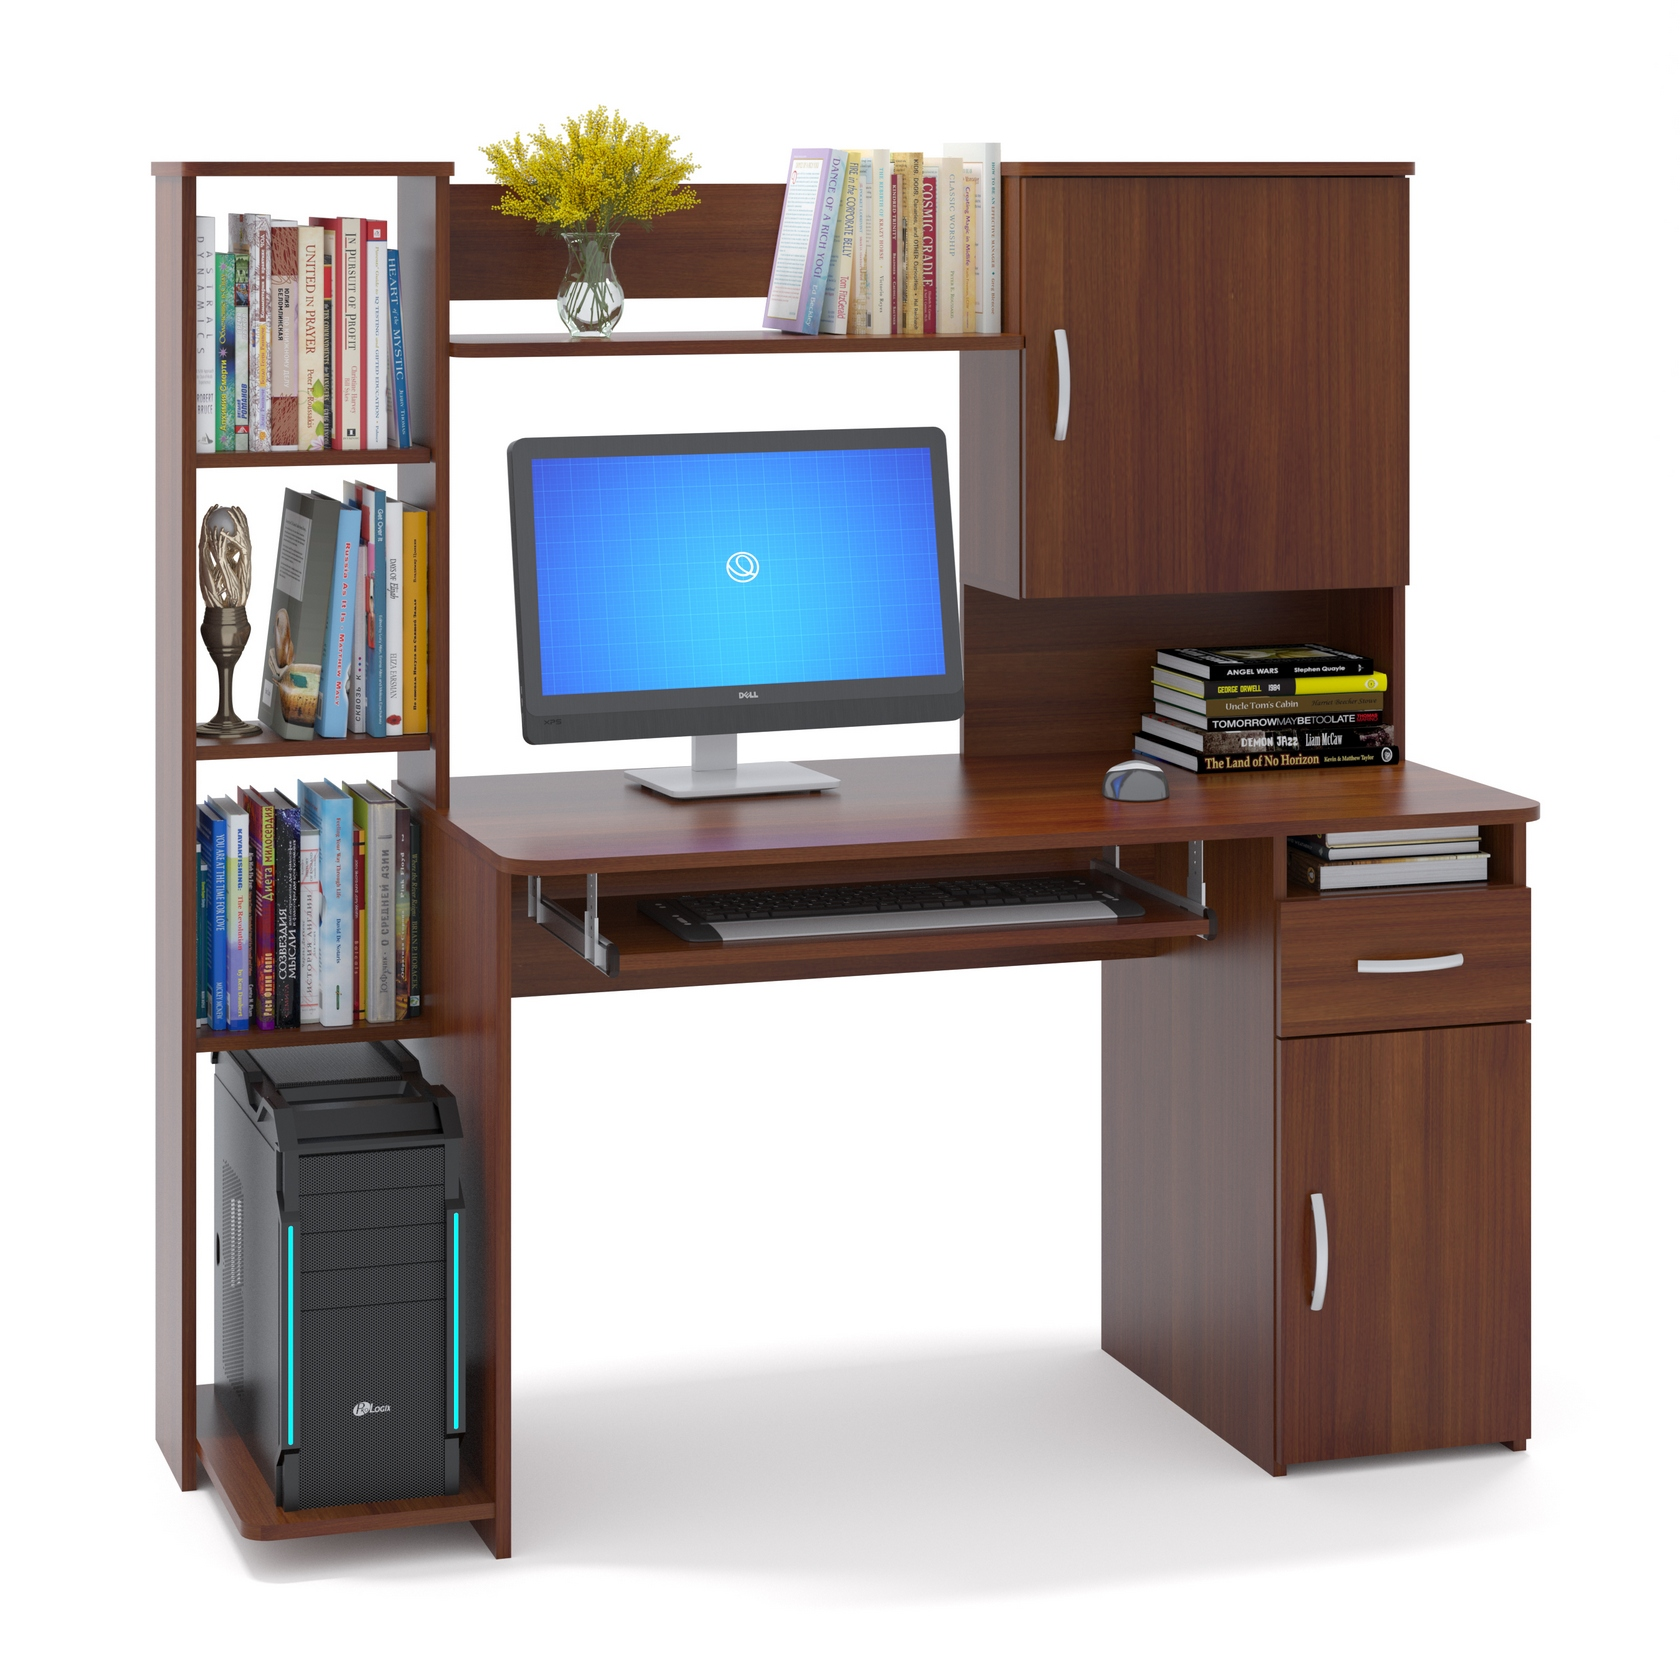 Компьютерный стол сокол кст-08